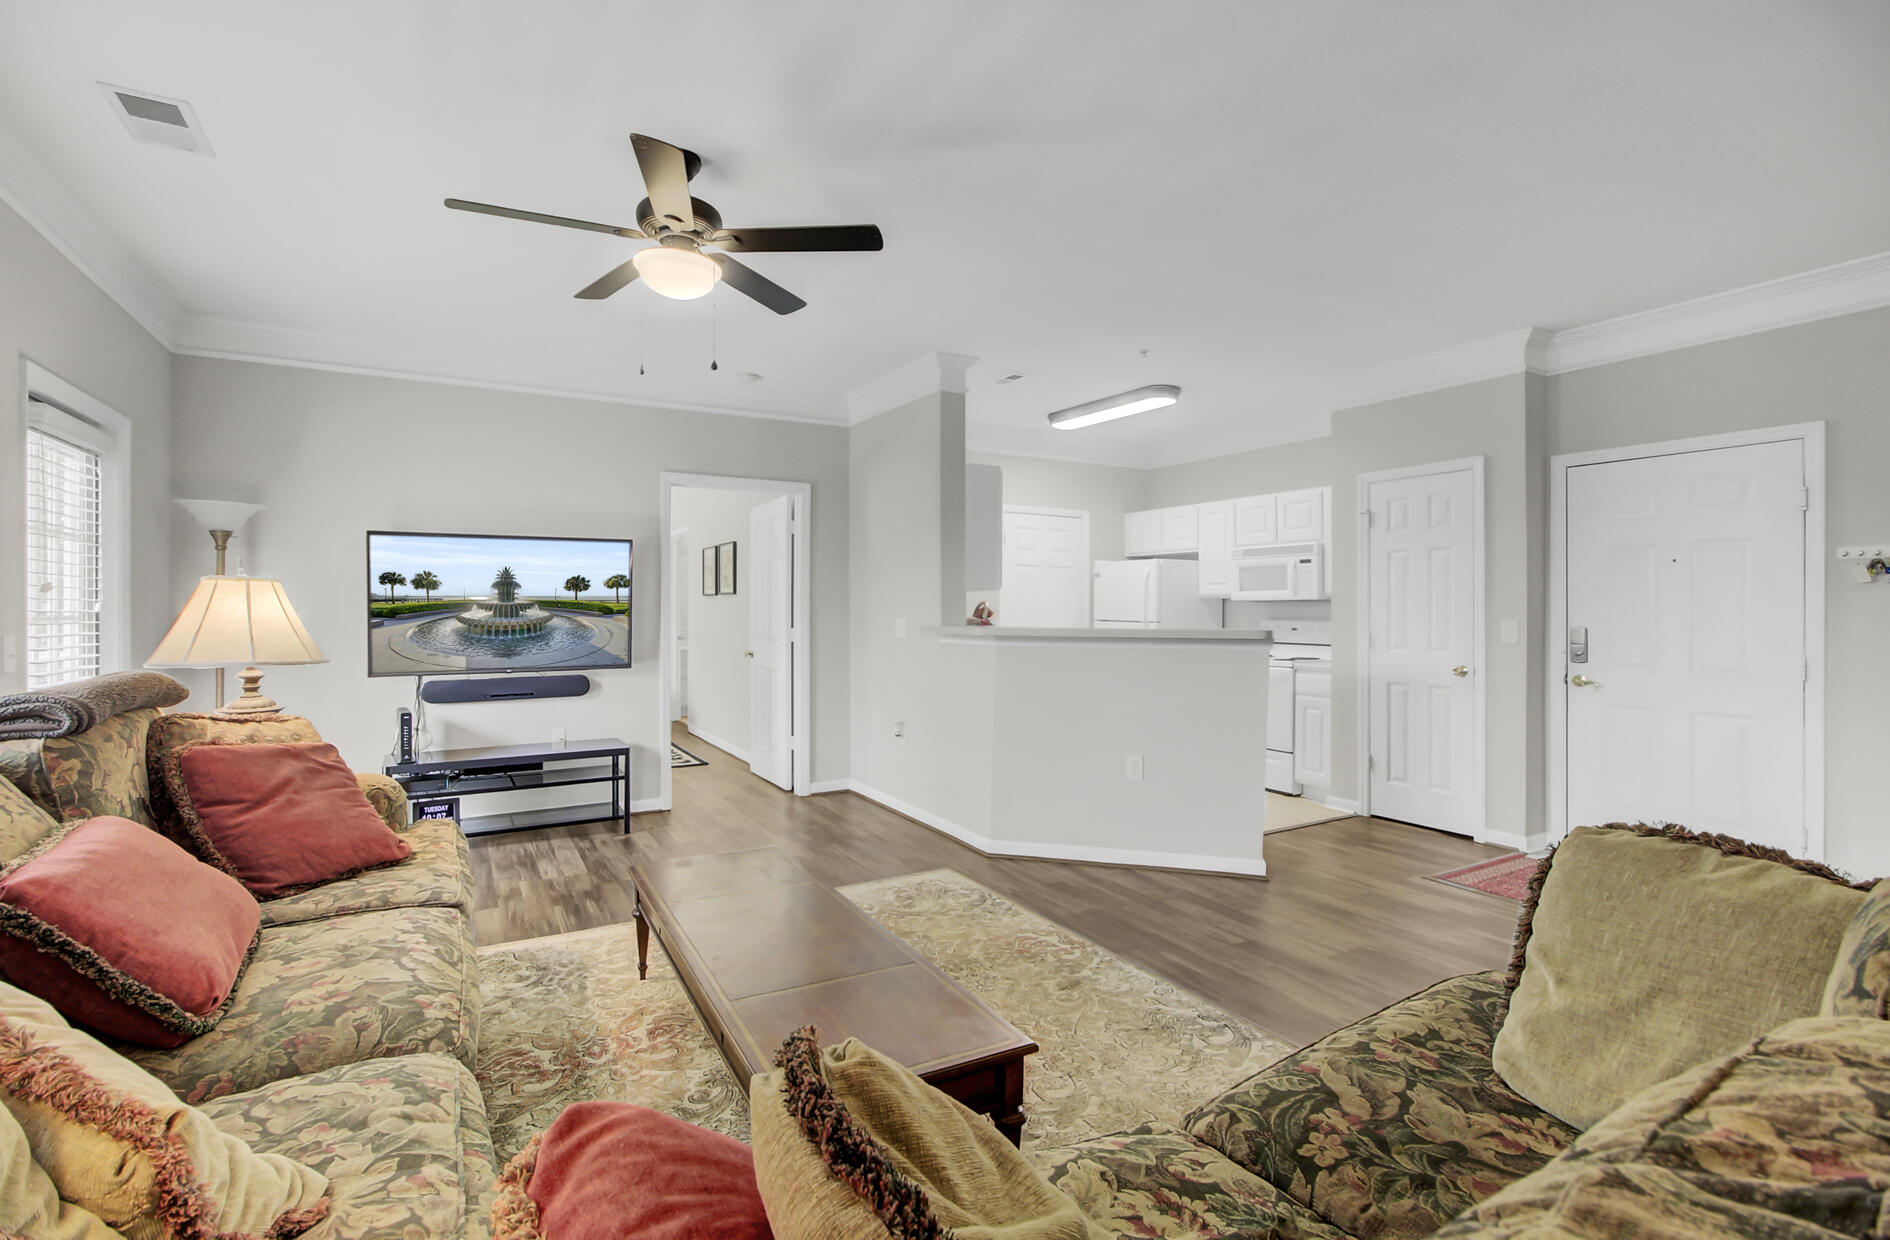 Cambridge Lakes Homes For Sale - 1485 Cambridge Lakes, Mount Pleasant, SC - 5